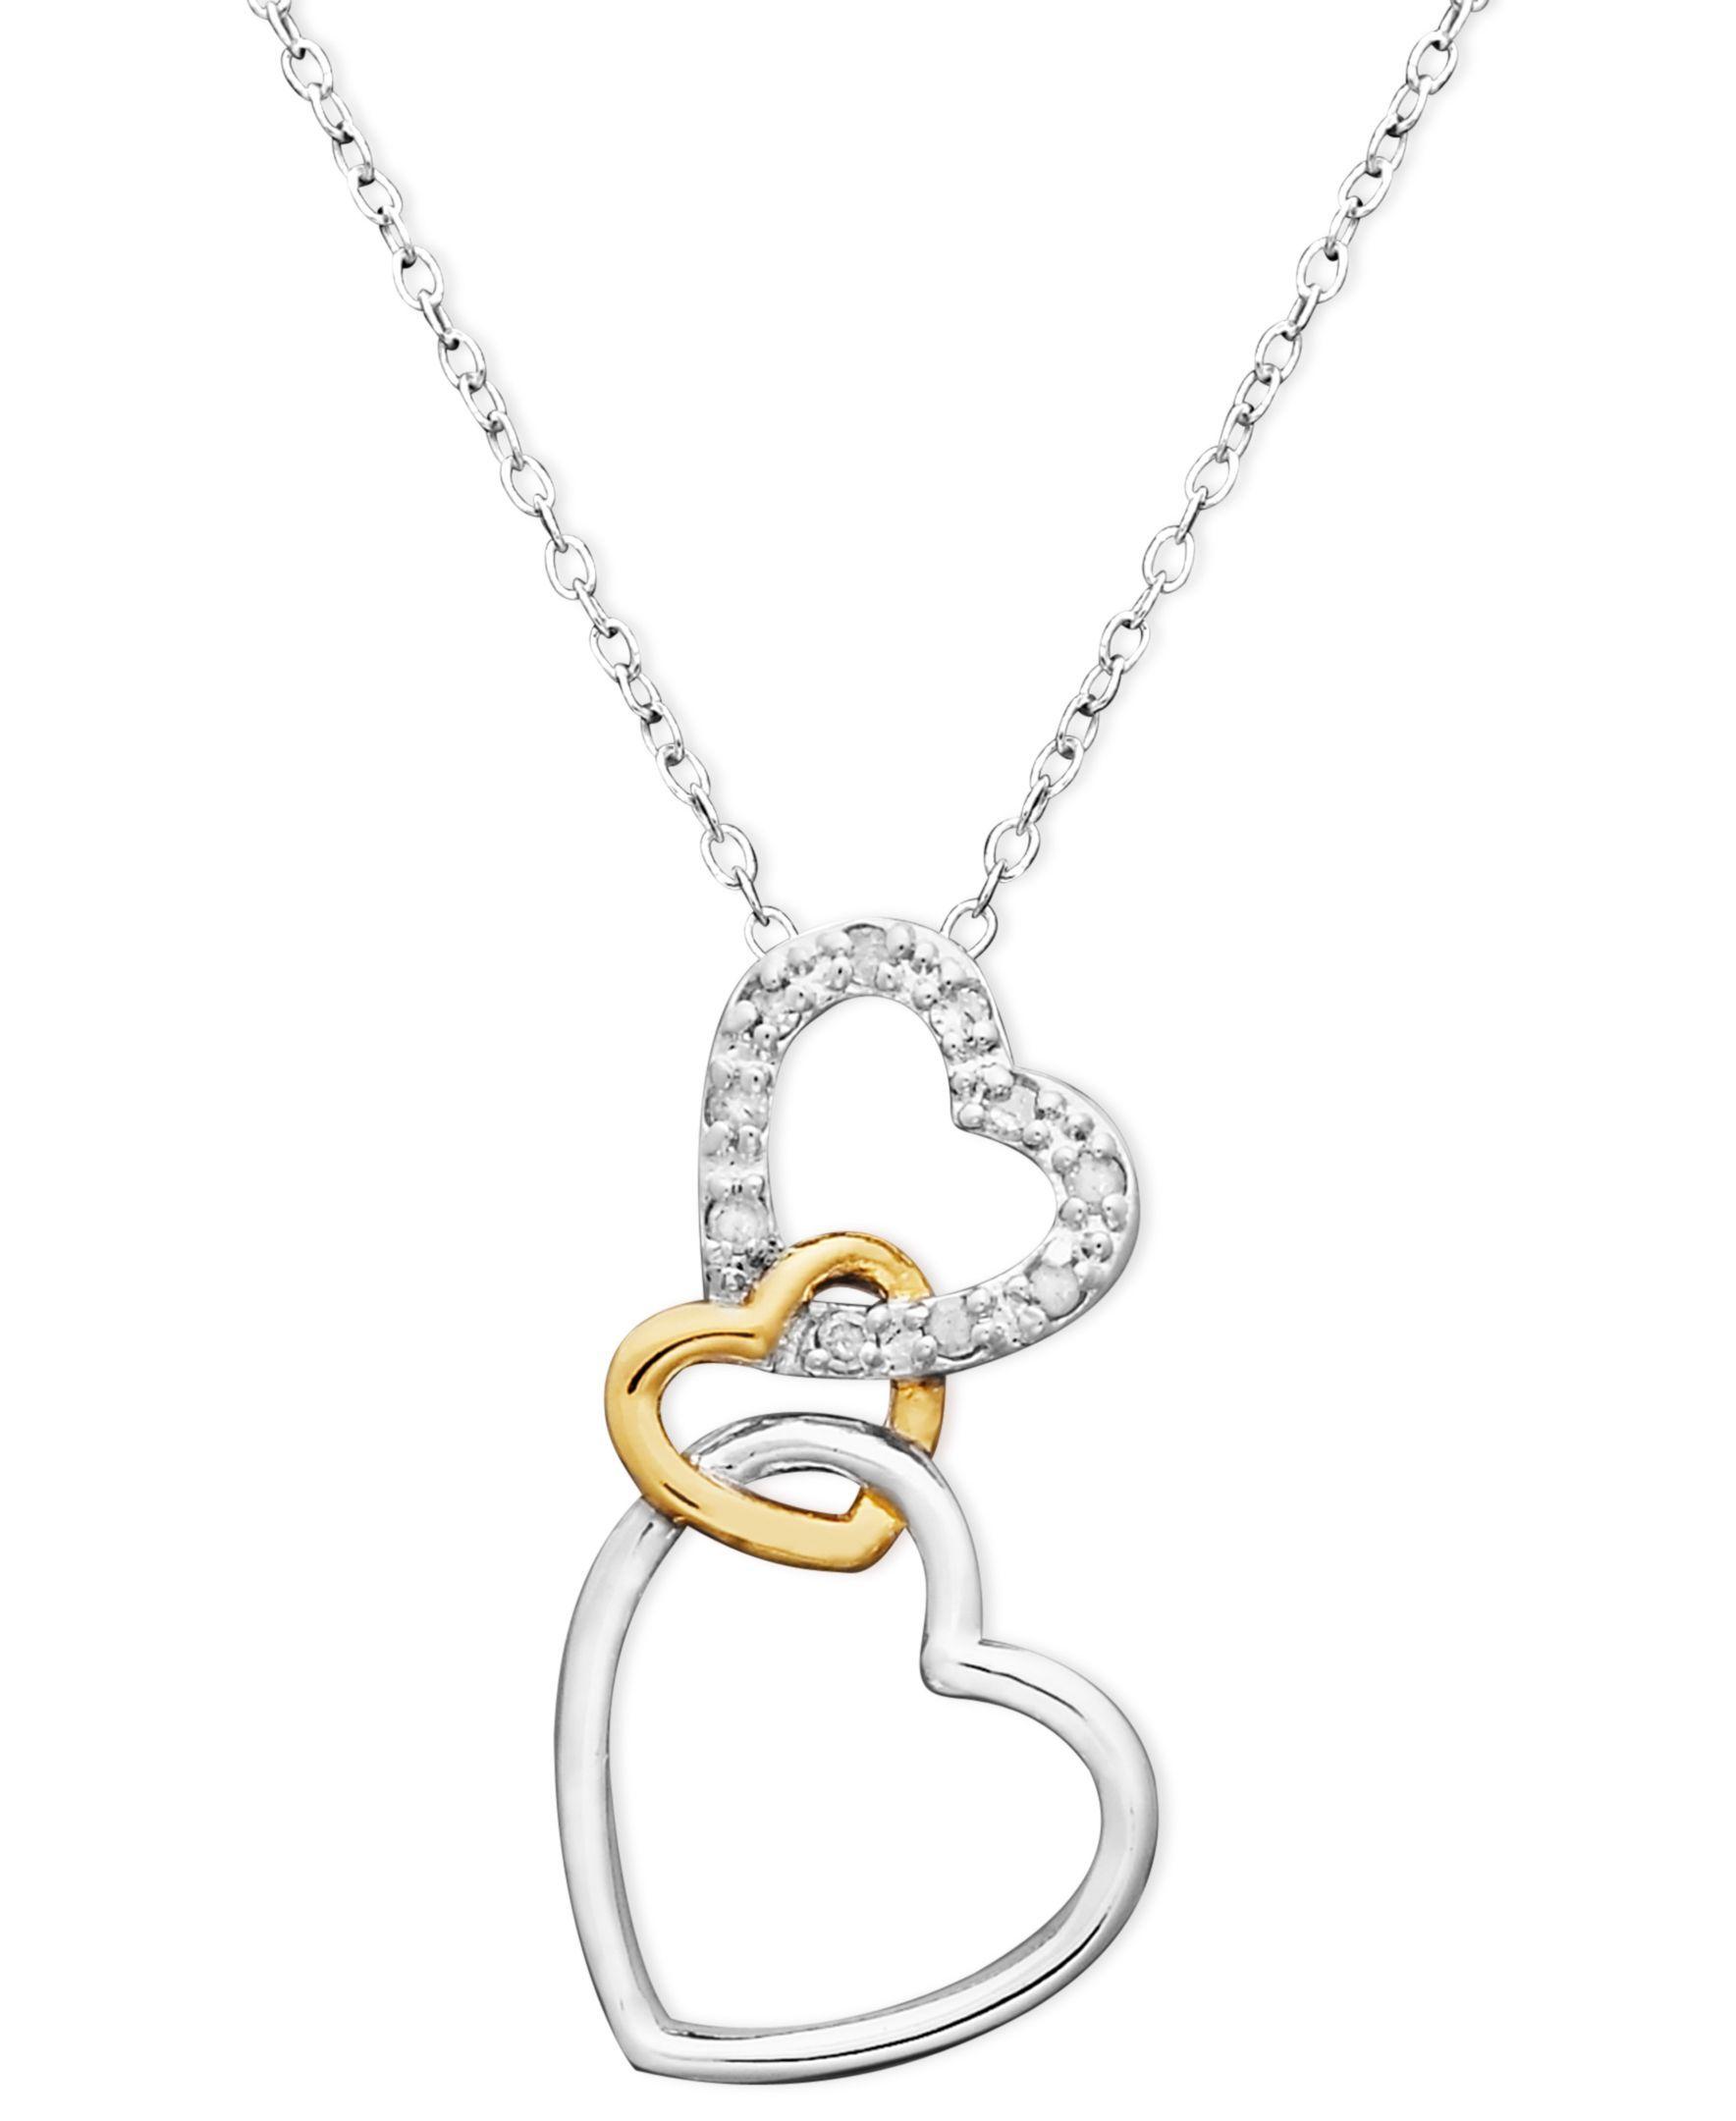 "Valentines Day Gifts 14k Gold /""Love/"" Script Diamond Heart Pendant Necklace"